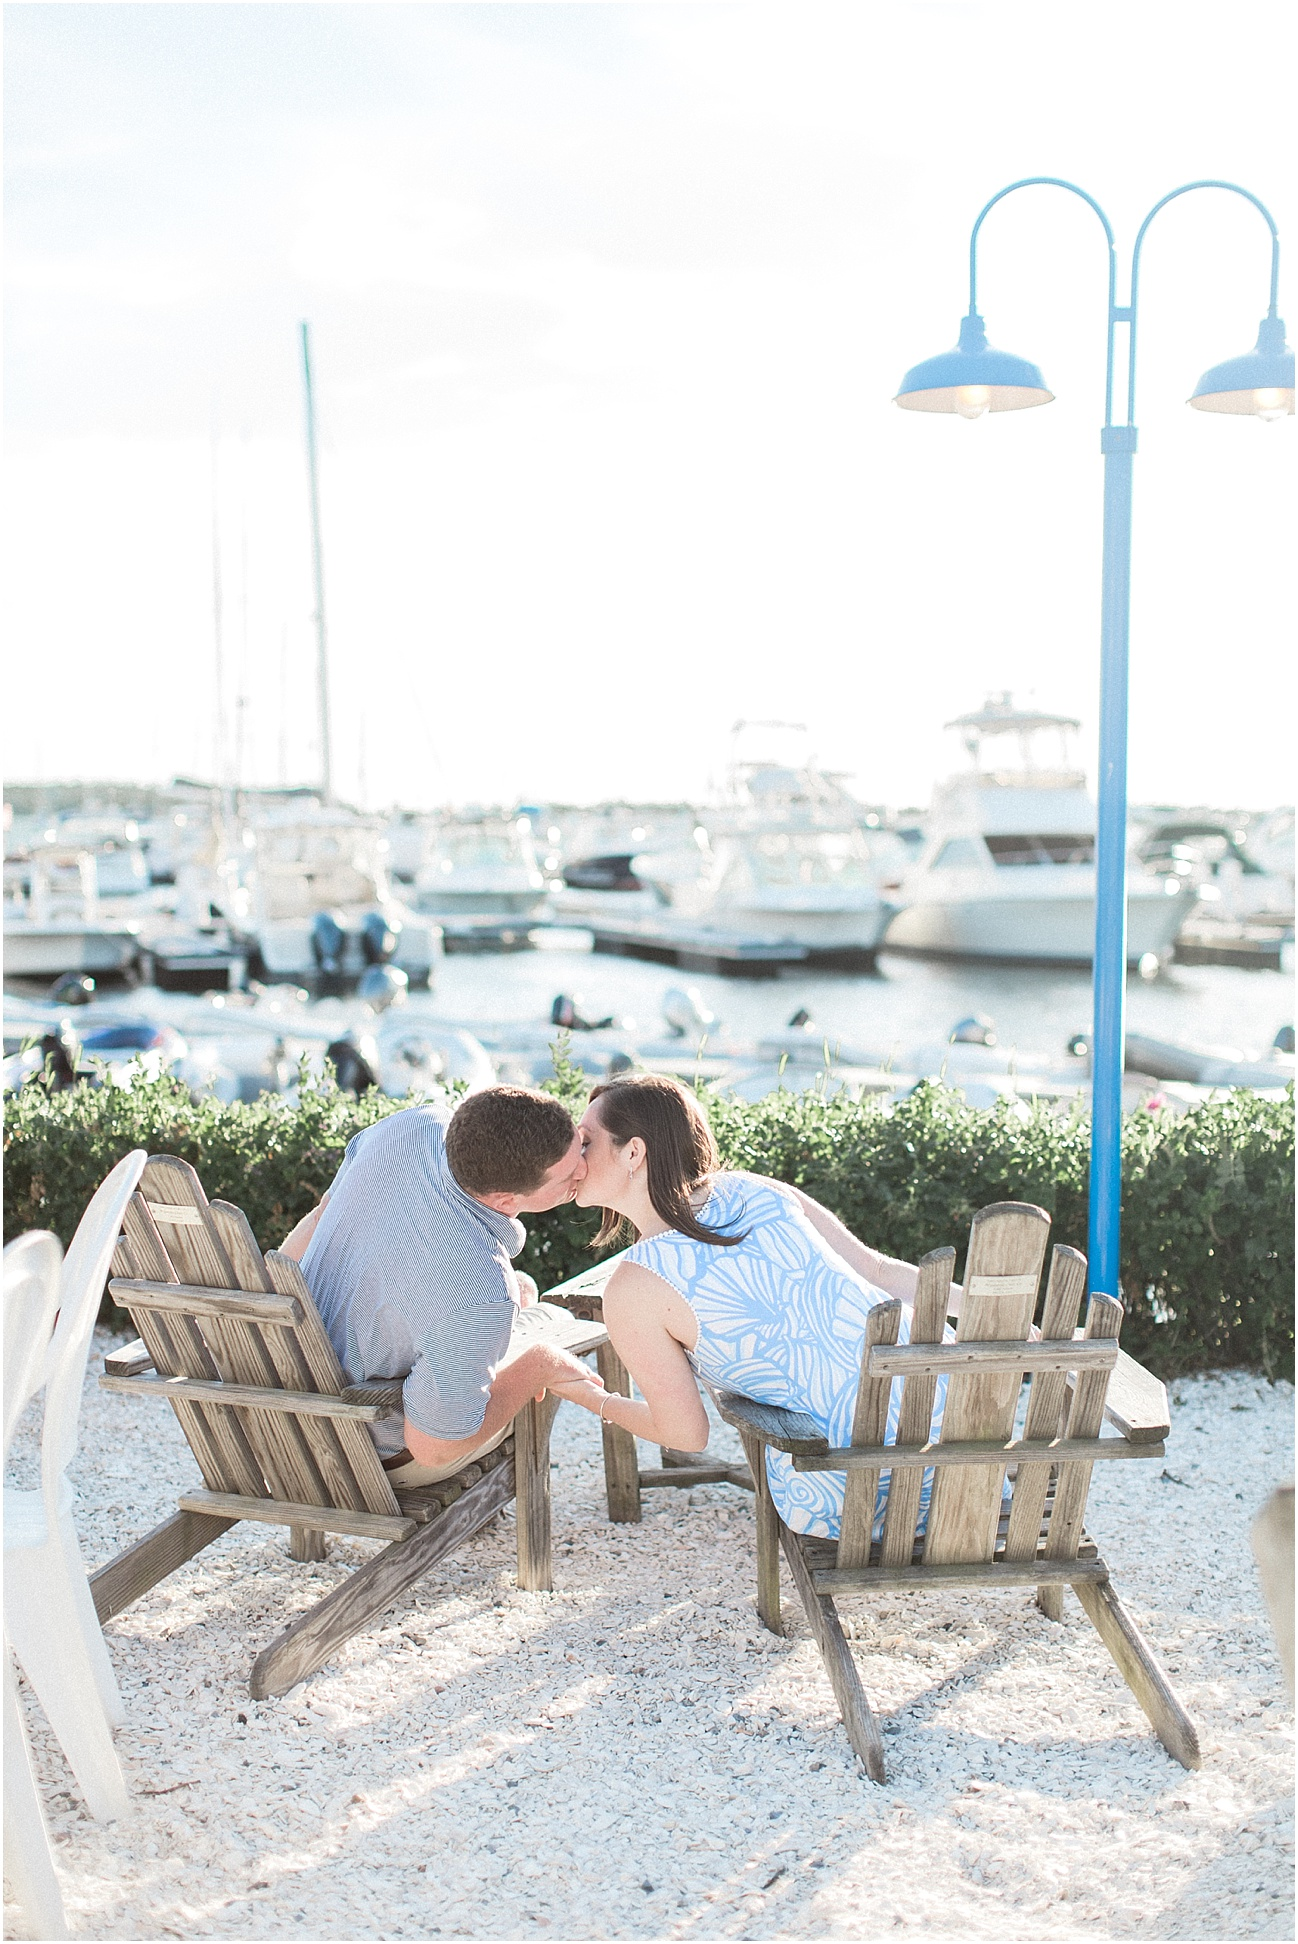 shannon_dan_engagement_session_sea_crest_beach_old_silver_chartroom_yacht_club_cape_cod_boston_wedding_photographer_meredith_jane_photography_photo_0322.jpg